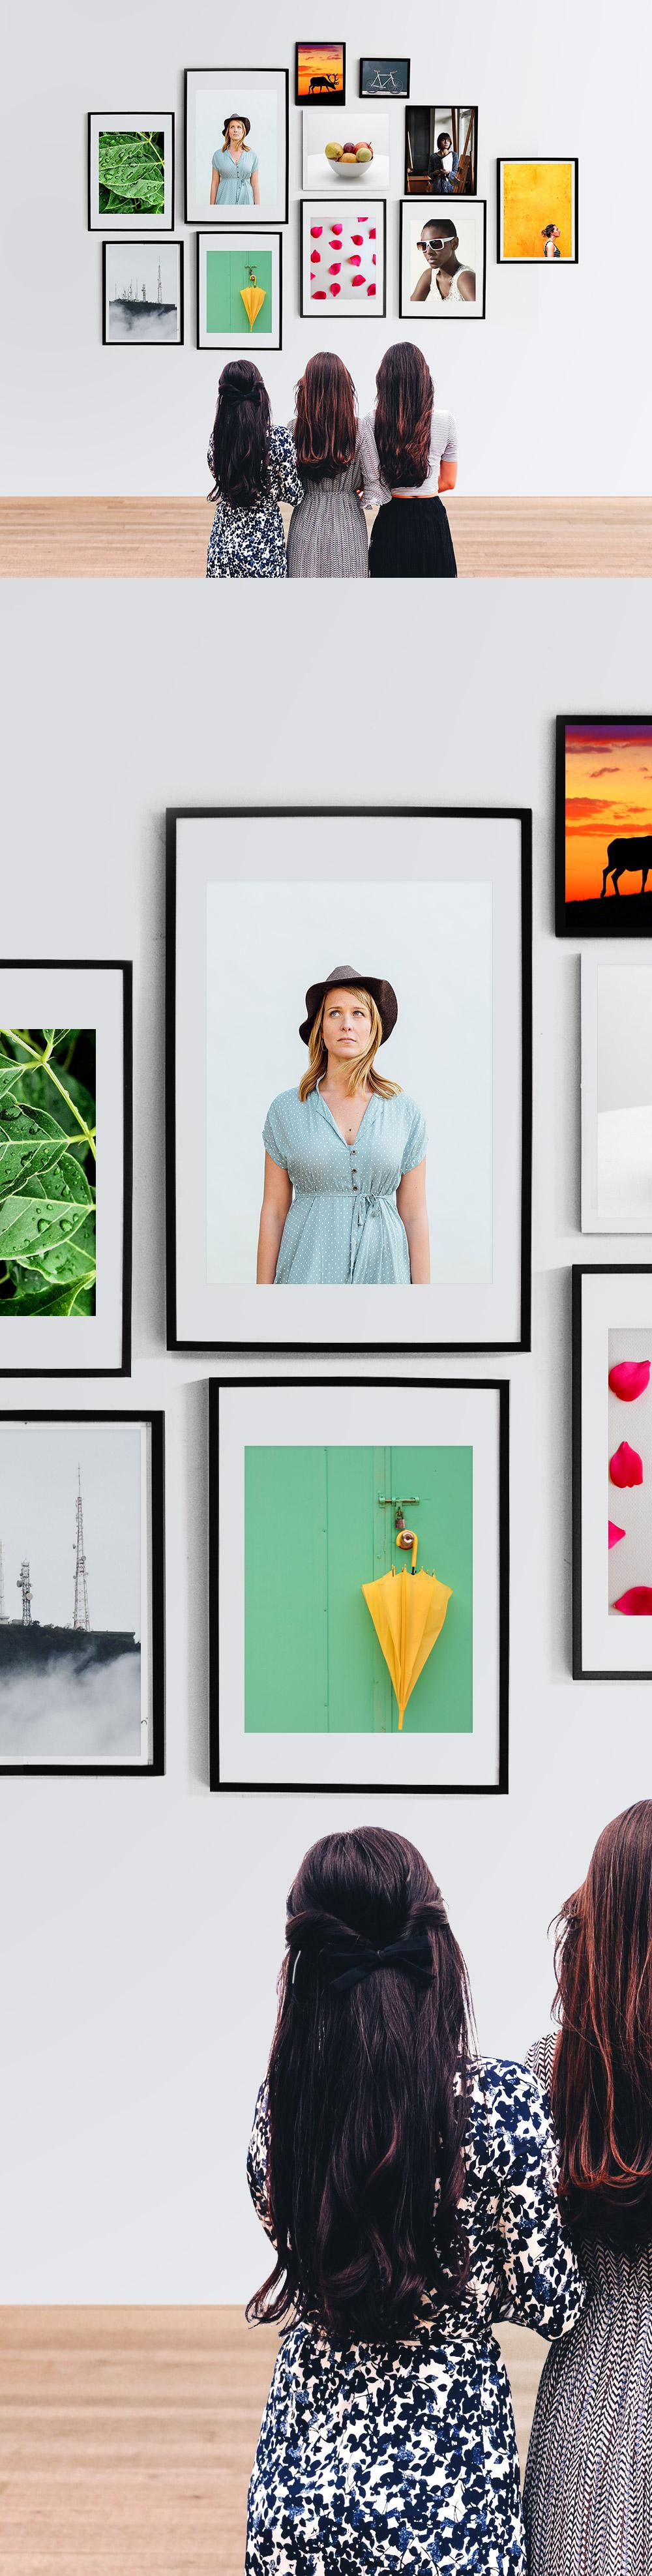 Wall Photo Frames Gallery Mockup